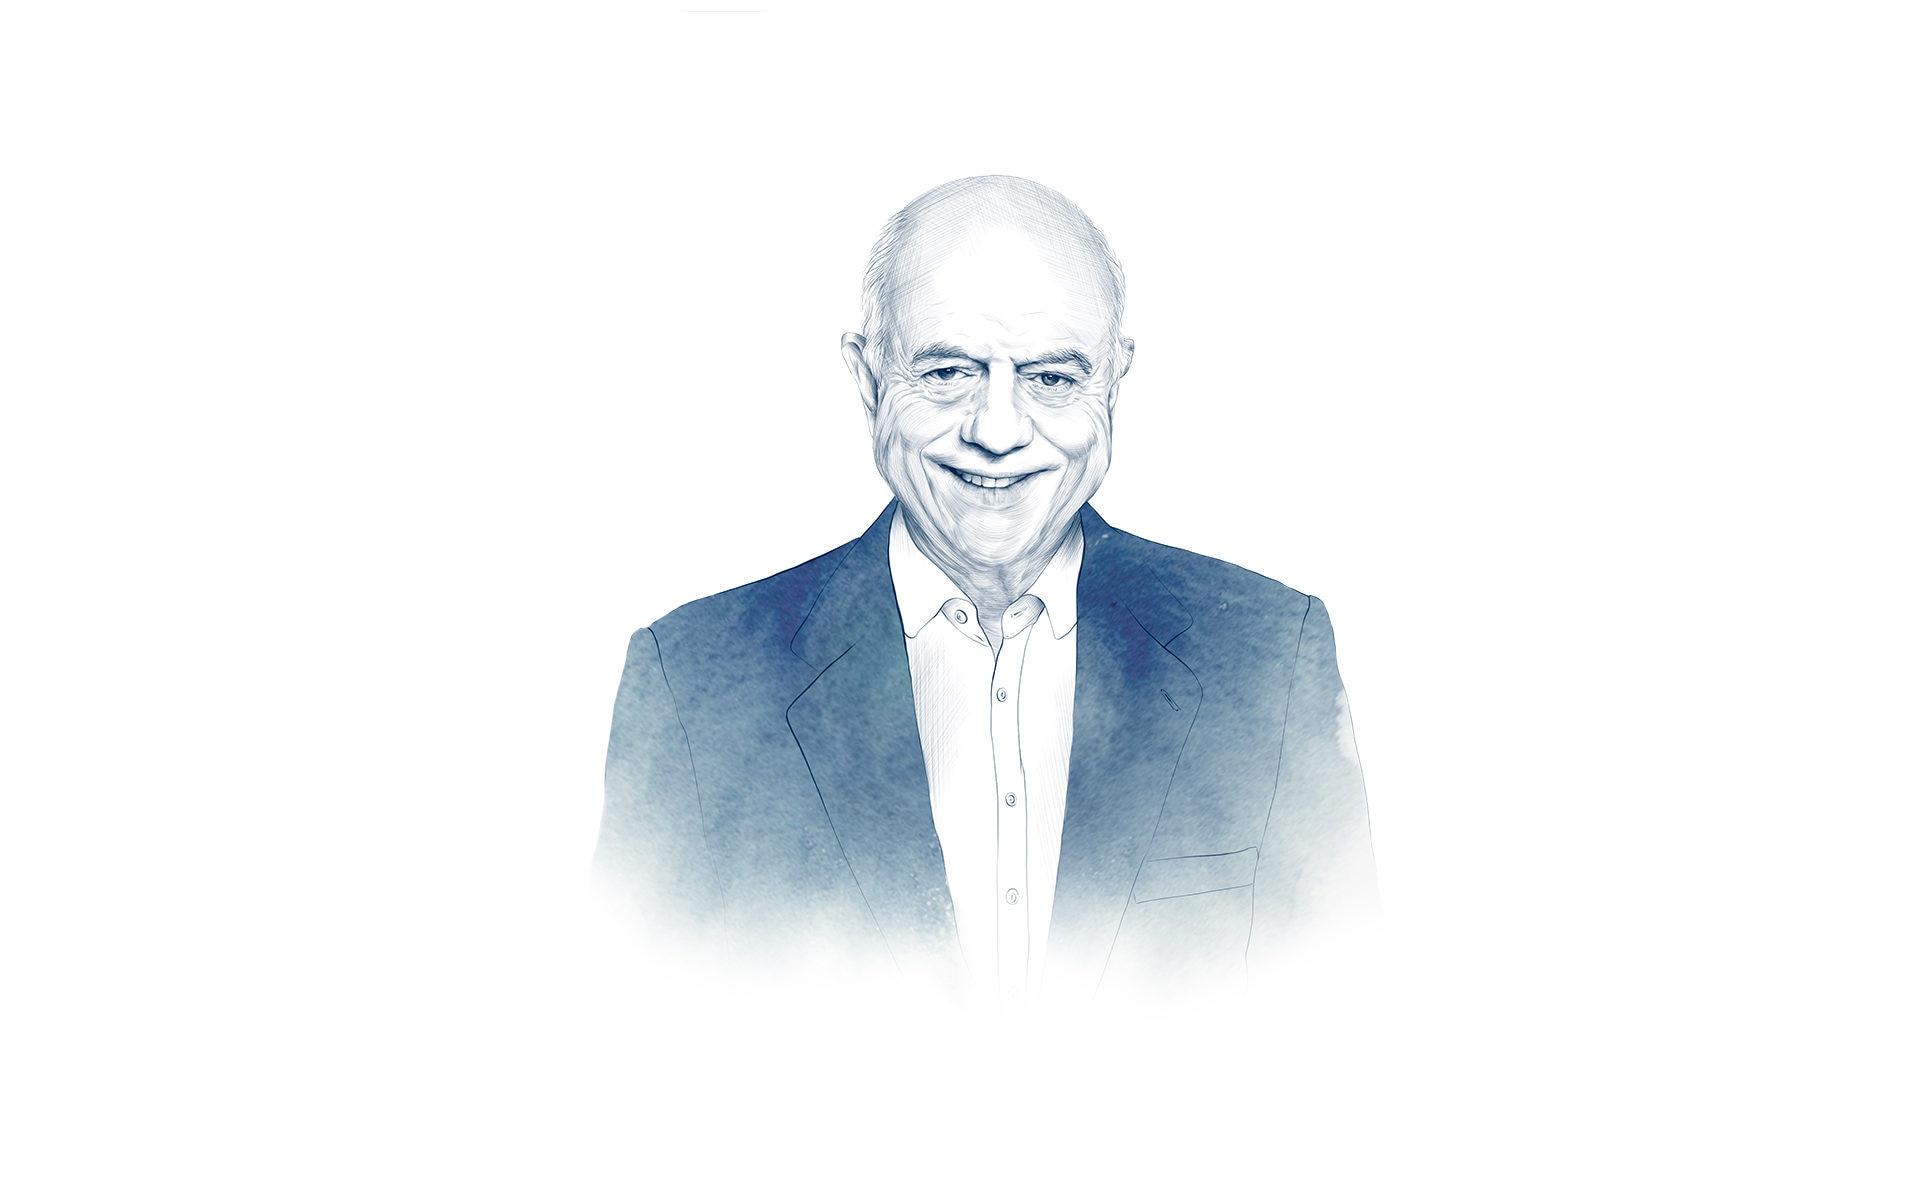 imagen de Francisco González retrato